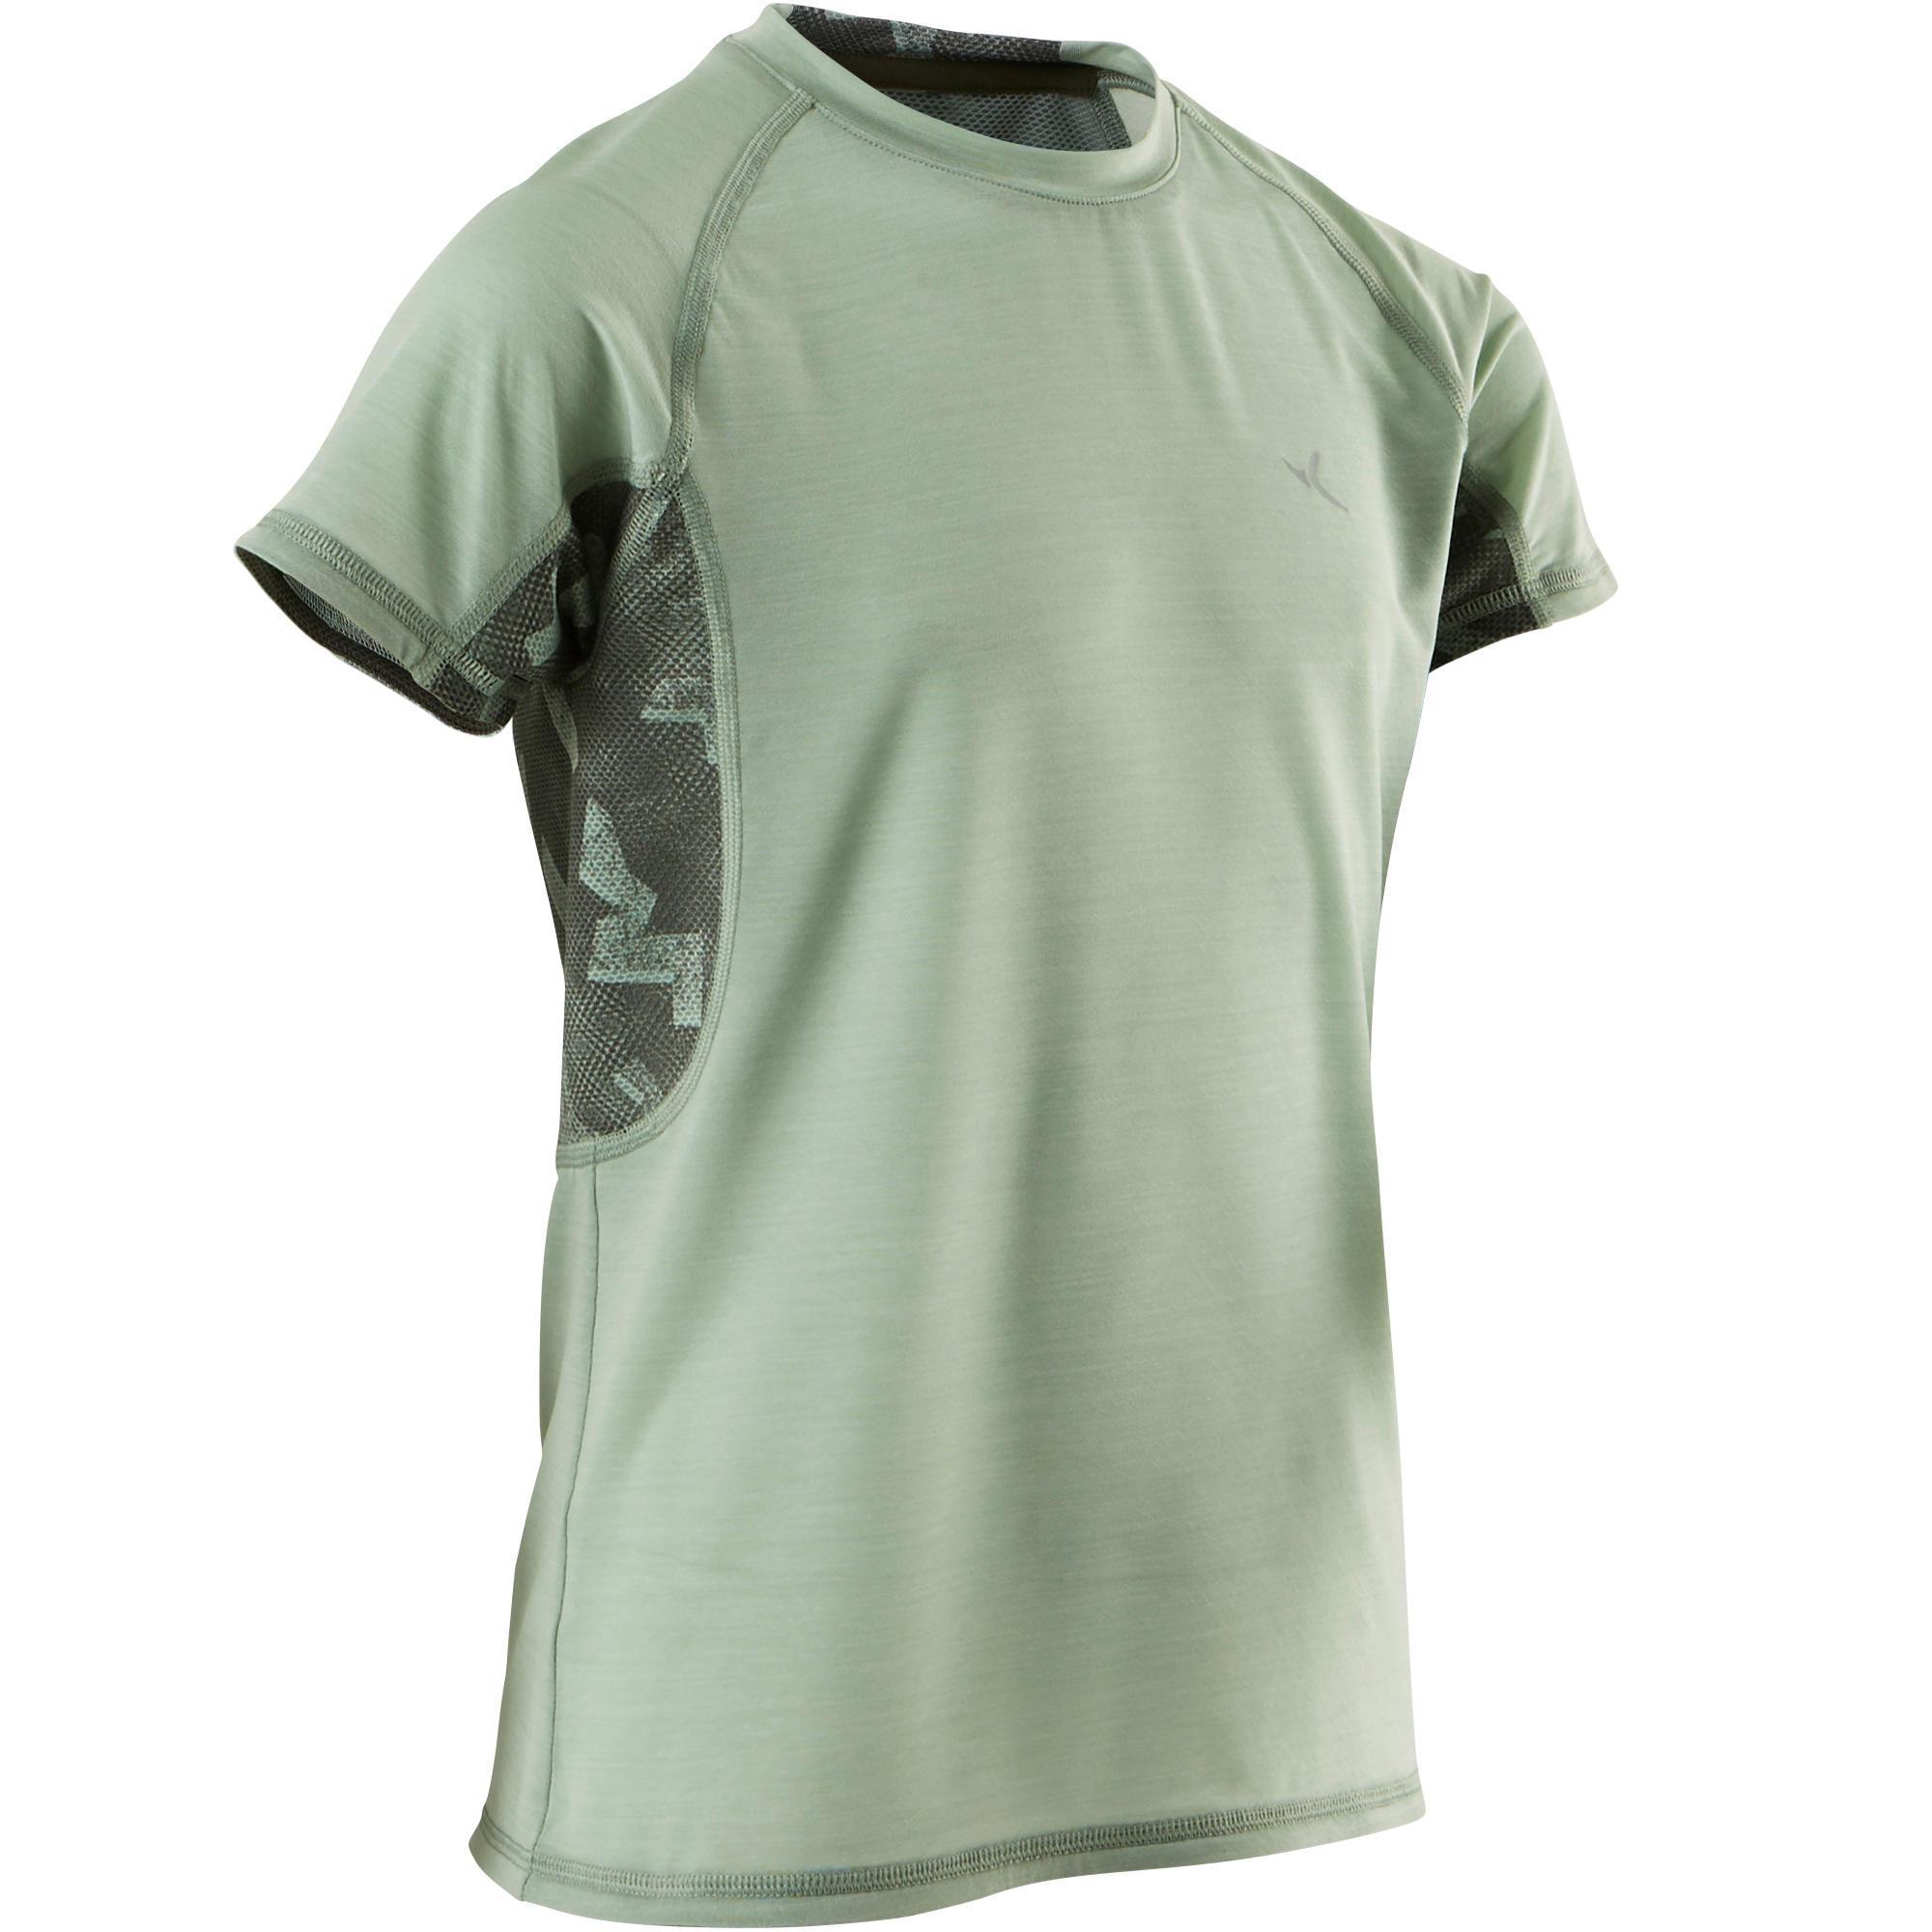 521046d76250f Domyos T-Shirt respirant manches courtes S900 garçon GYM ENFANT   Decathlon